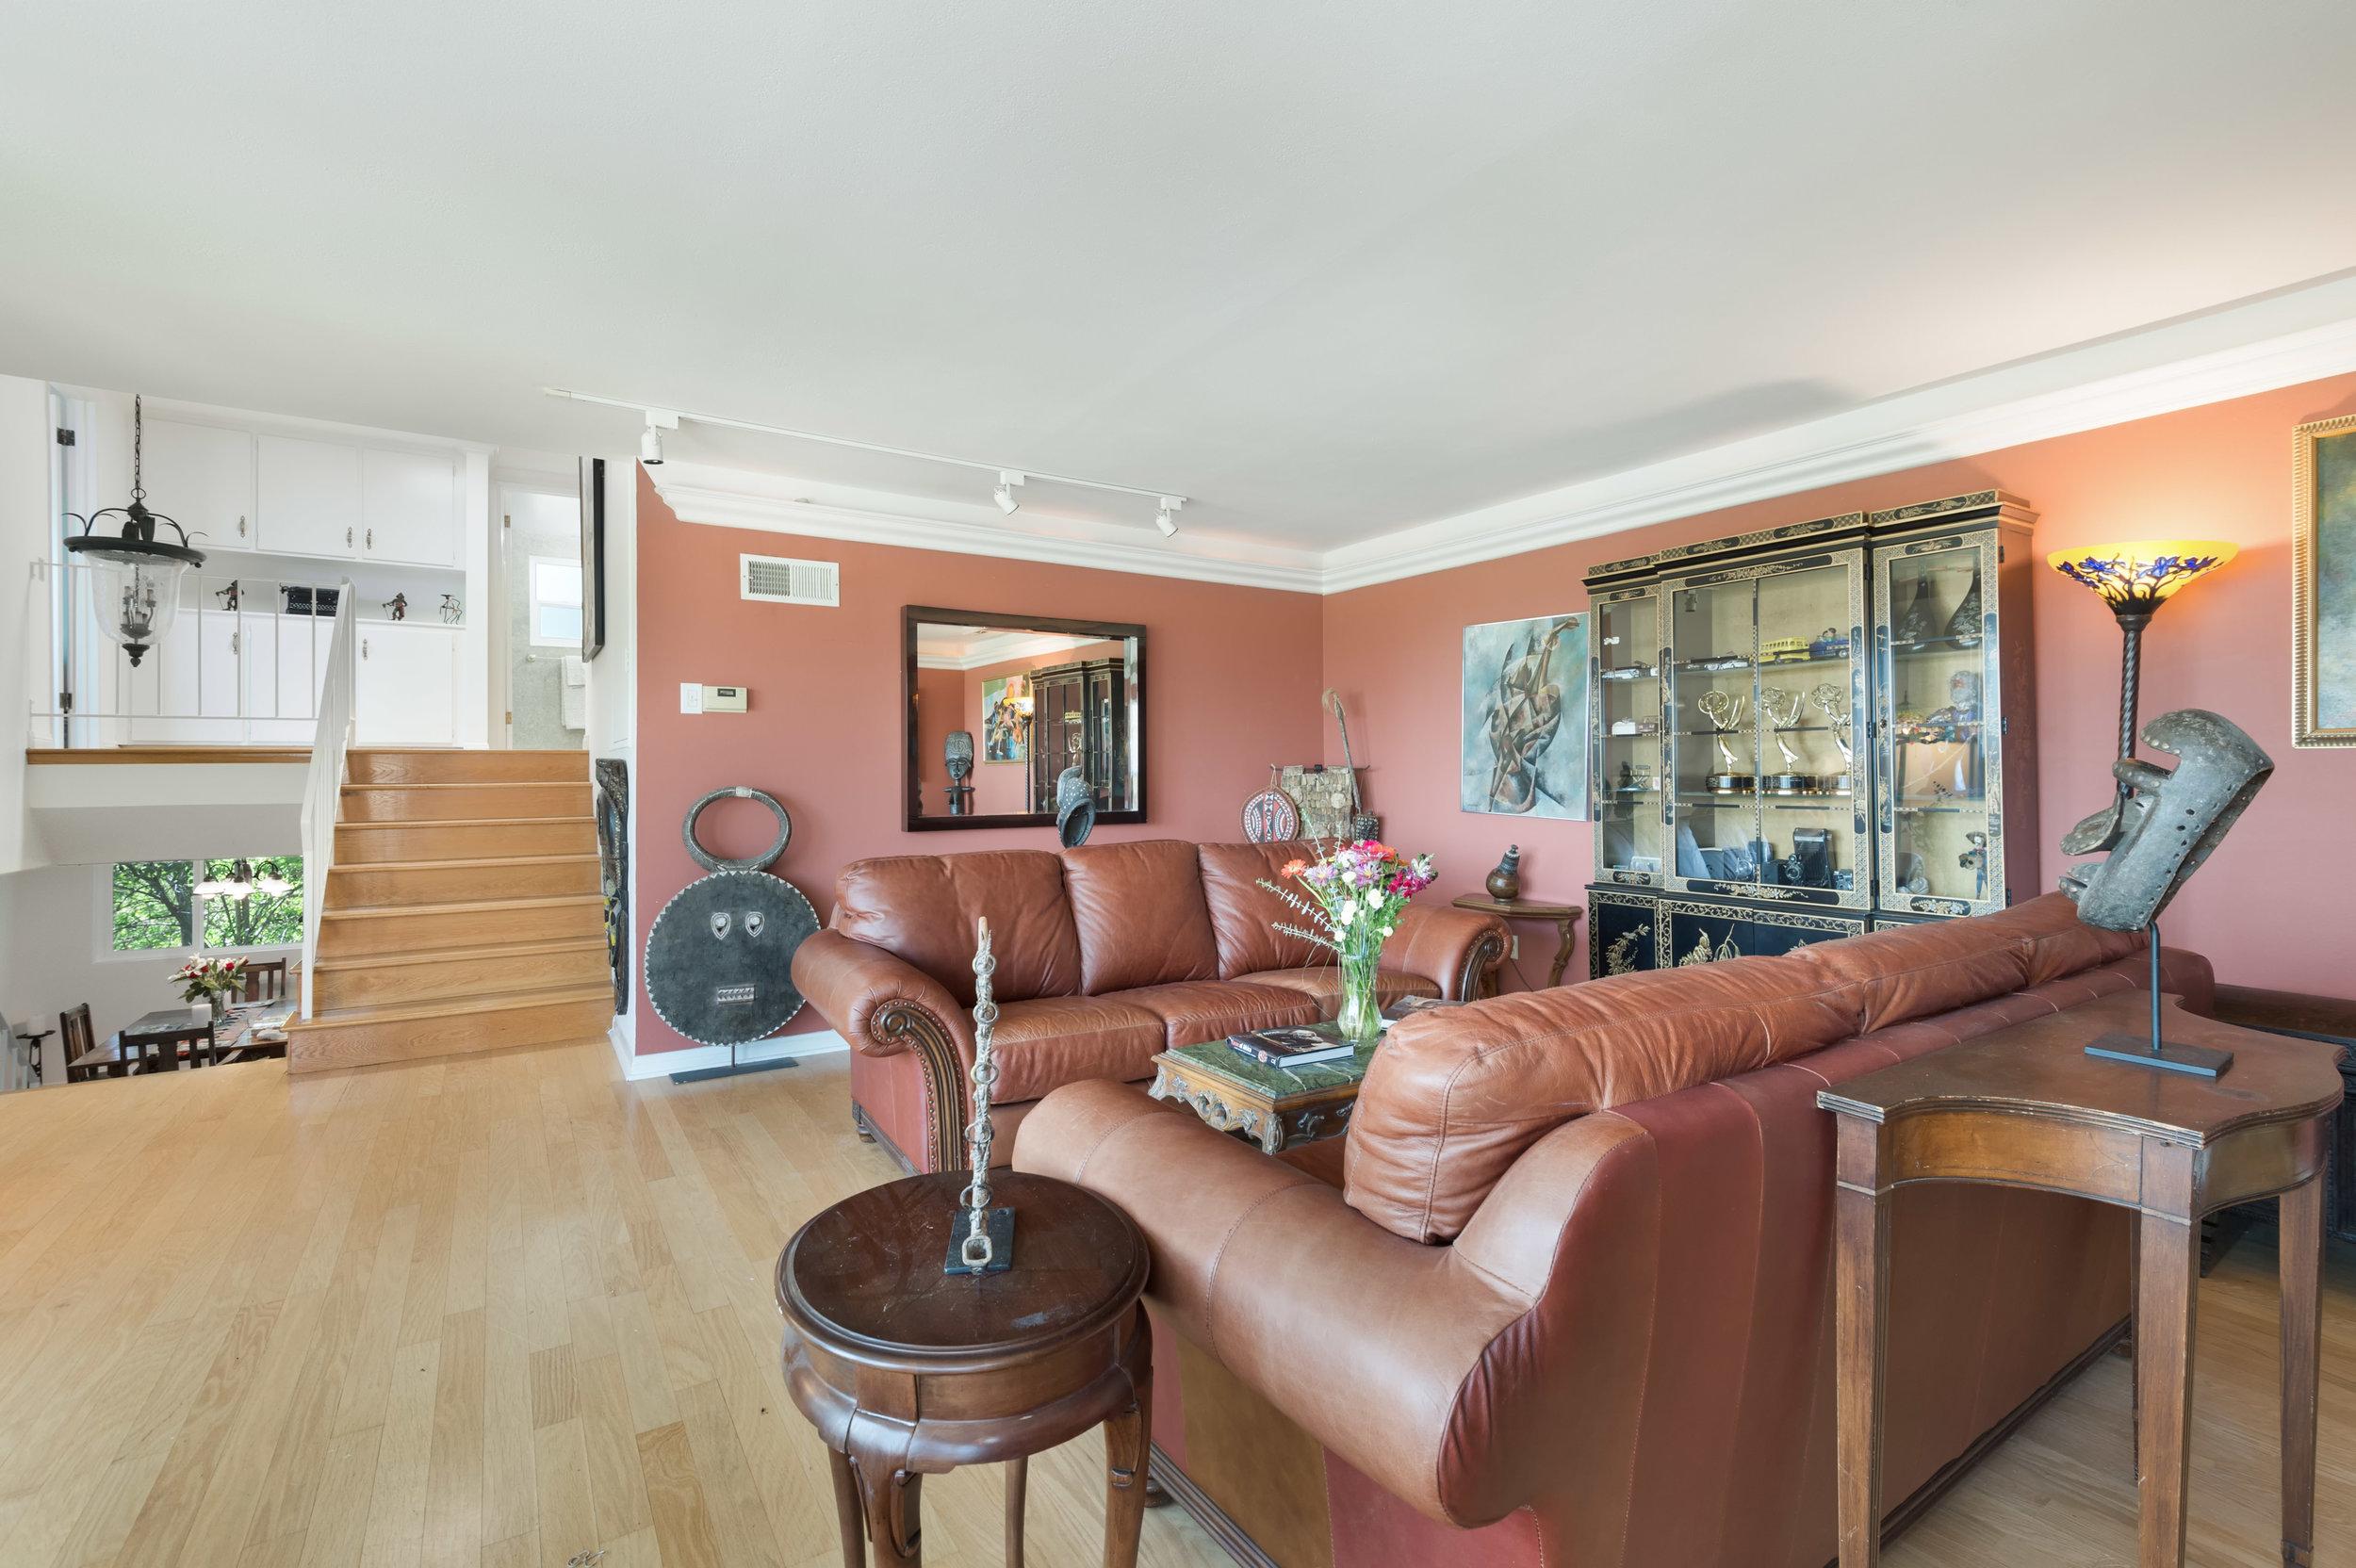 010.2 Living Room15072 Rayneta Sherman Oaks For Sale The Malibu Life Team Luxury Real Estate.jpg